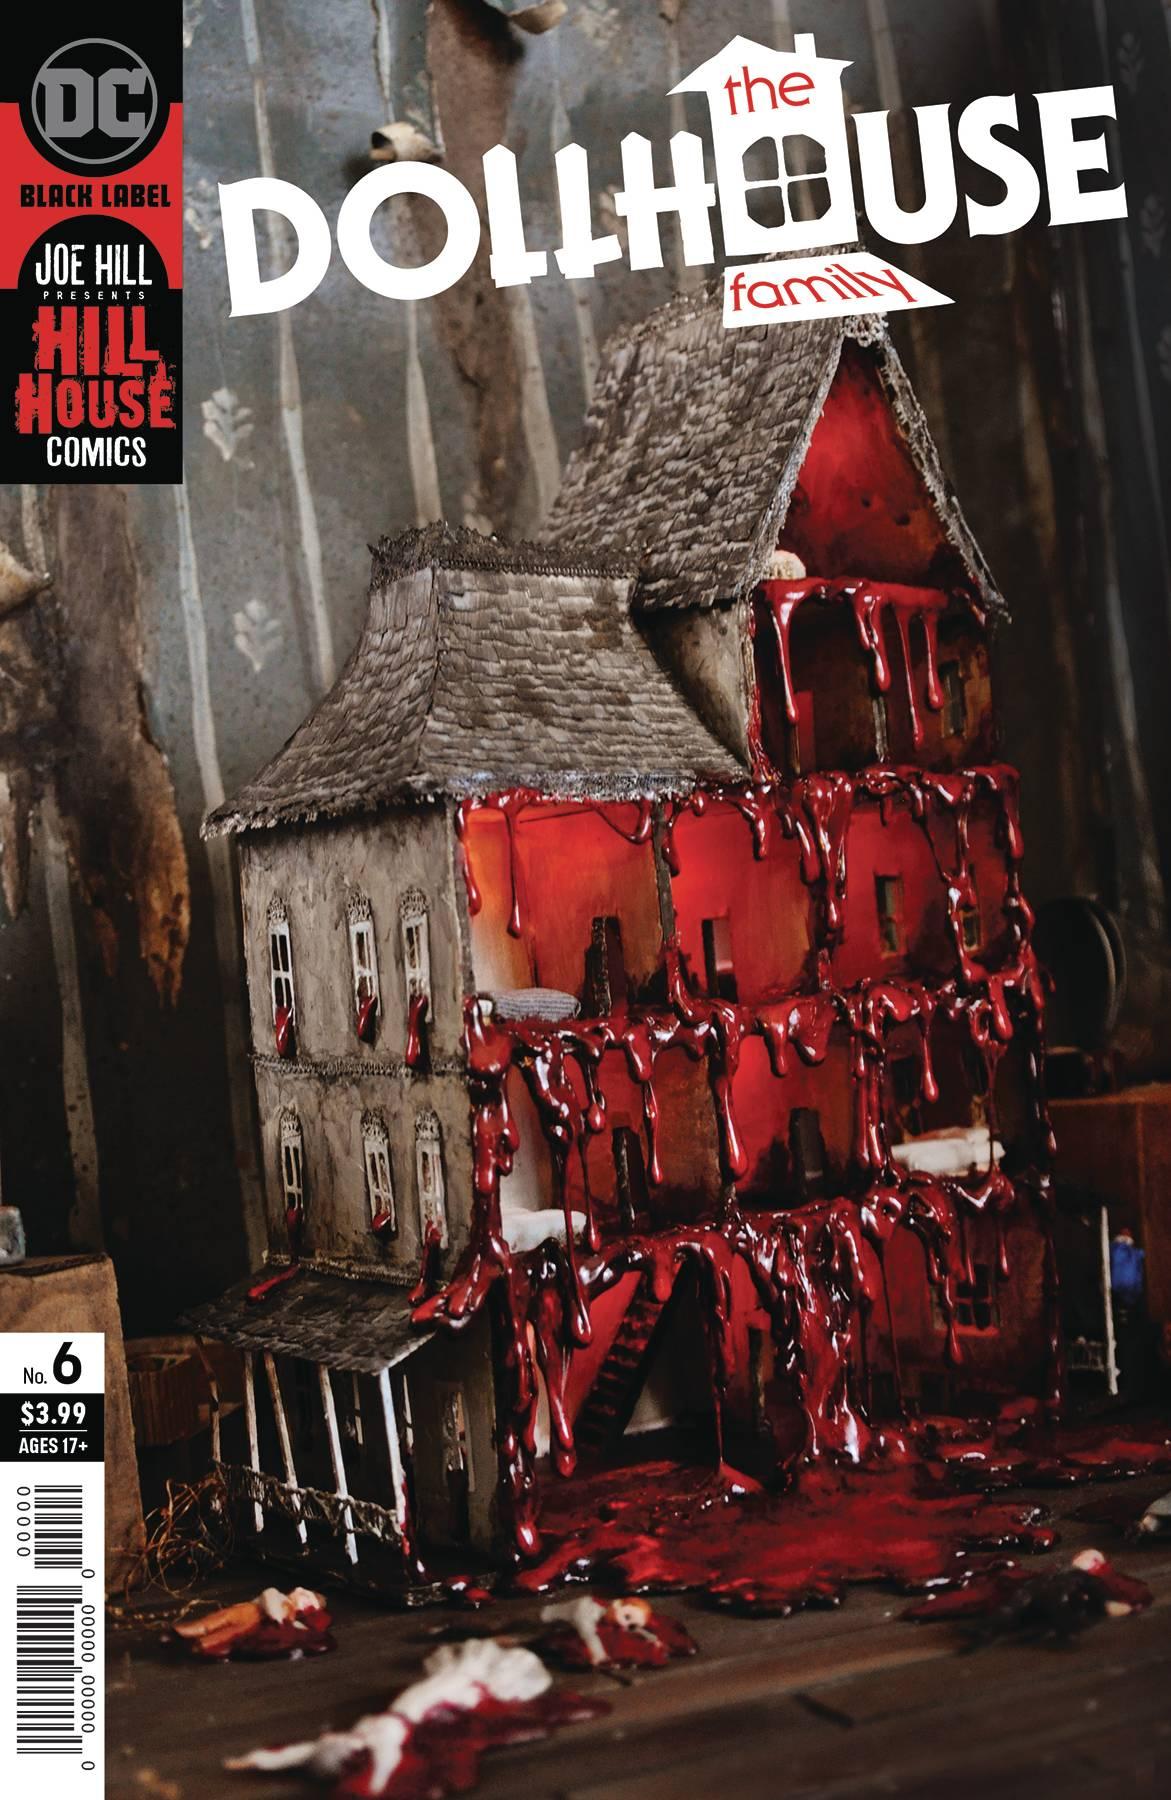 The Dollhouse Family #6 (2020)